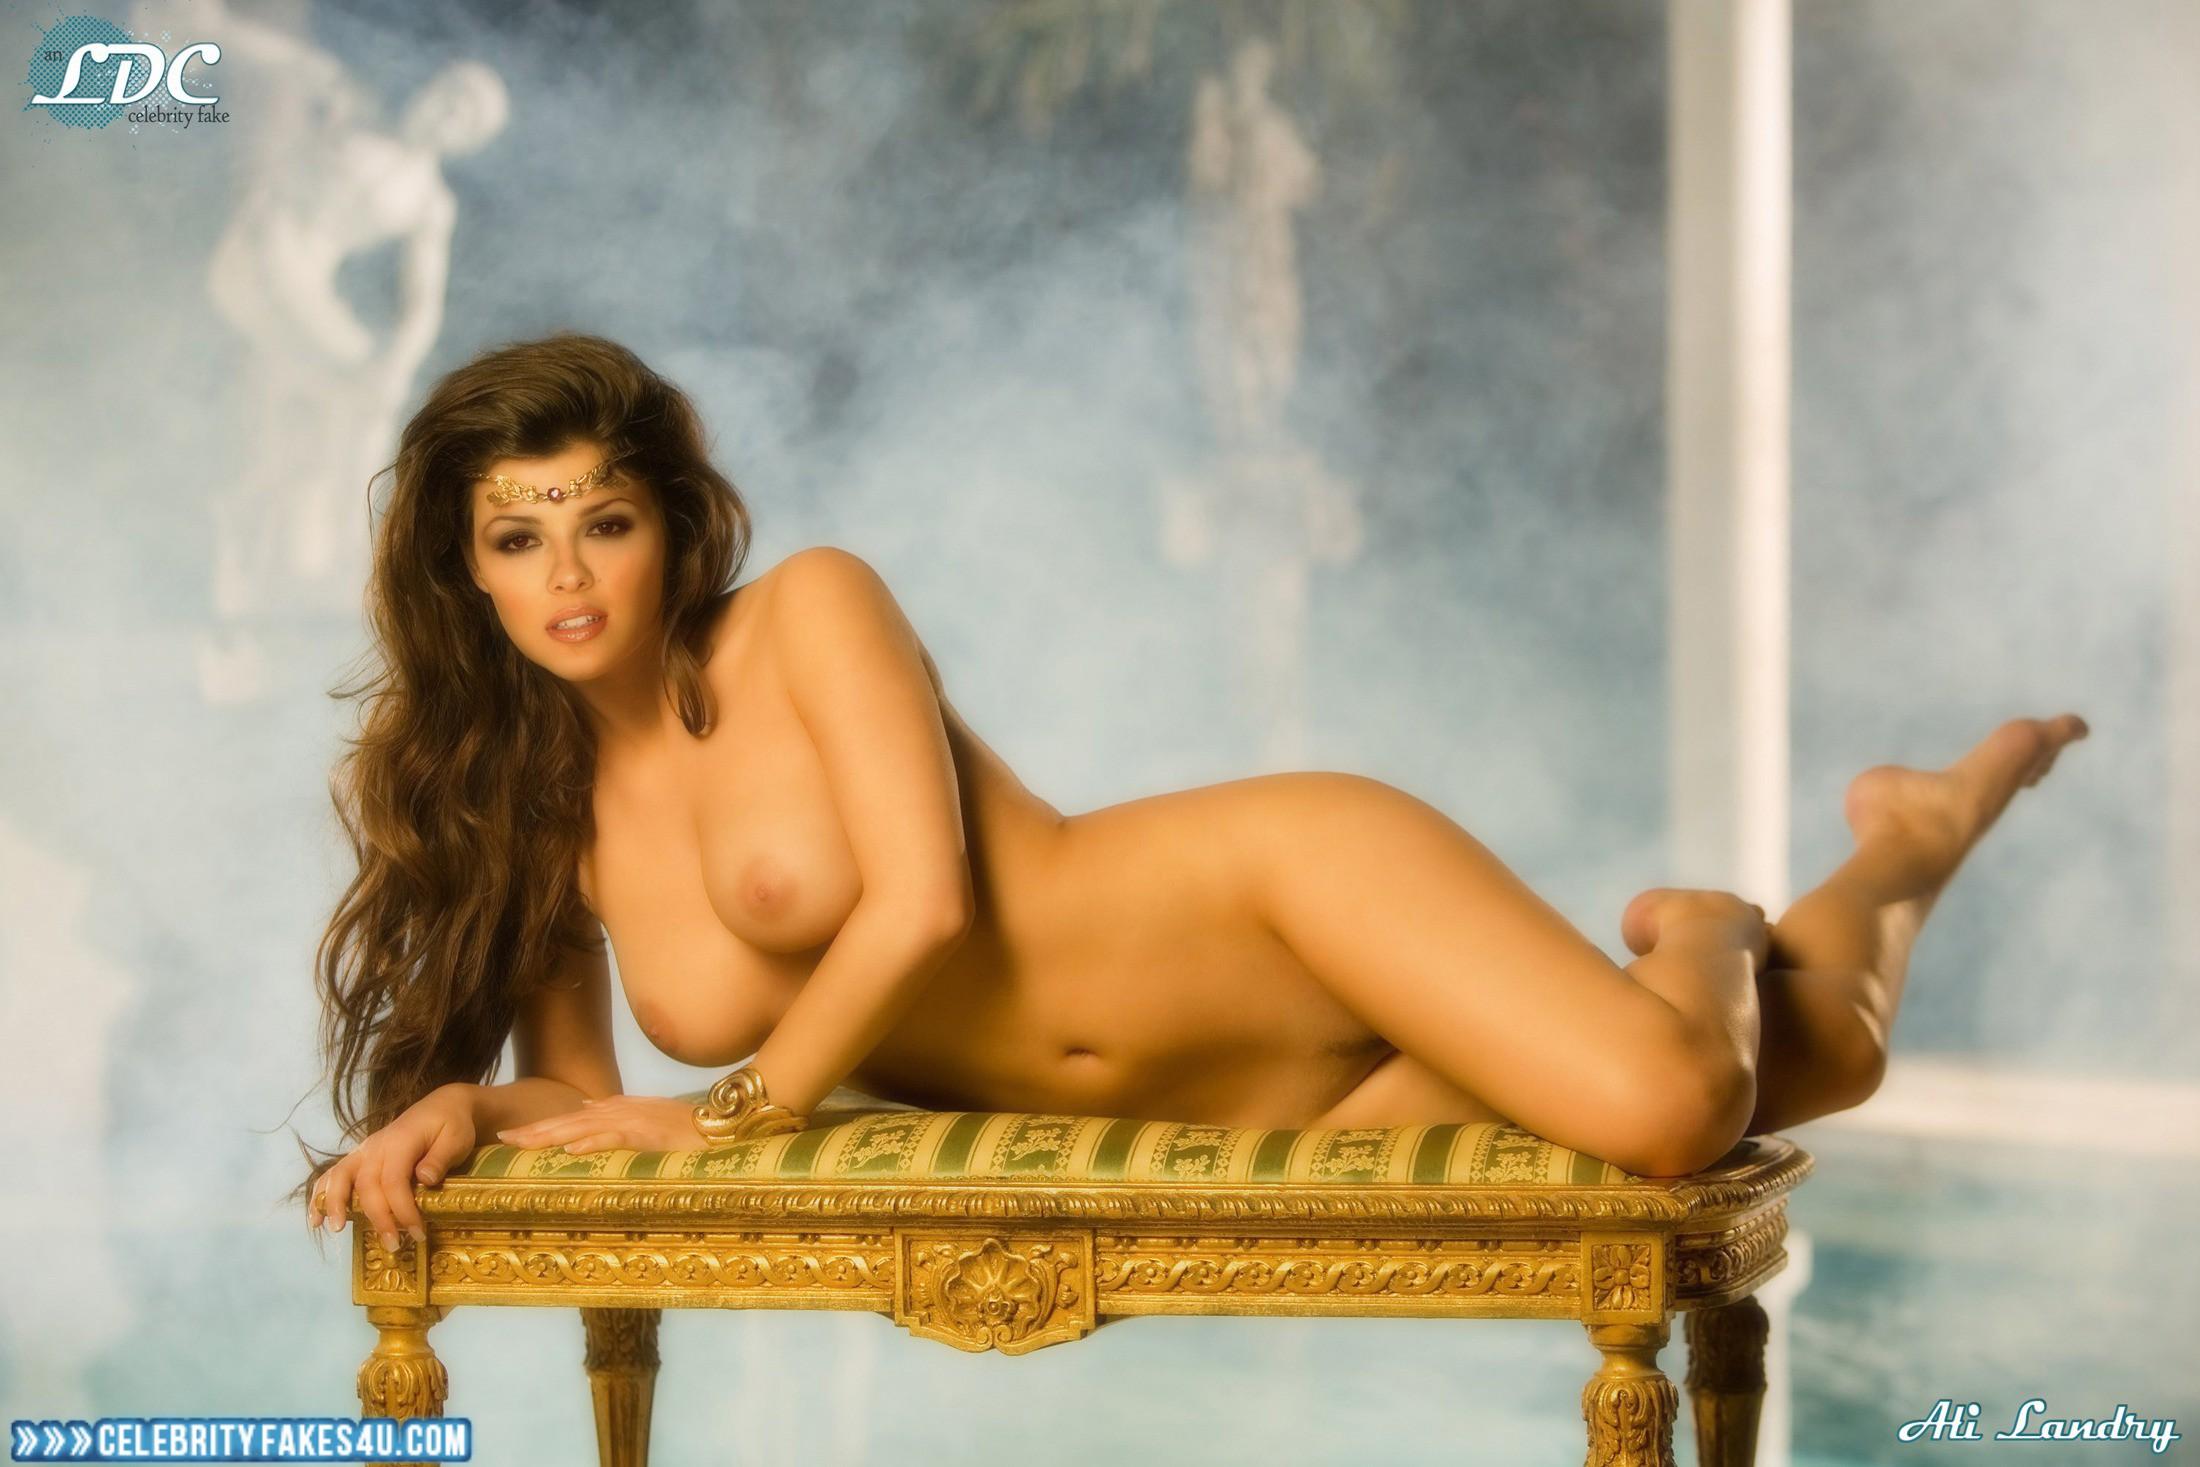 Ali landry tamil telugu malayalam kanada english sexy actress nude stills hollywood actress nude stills